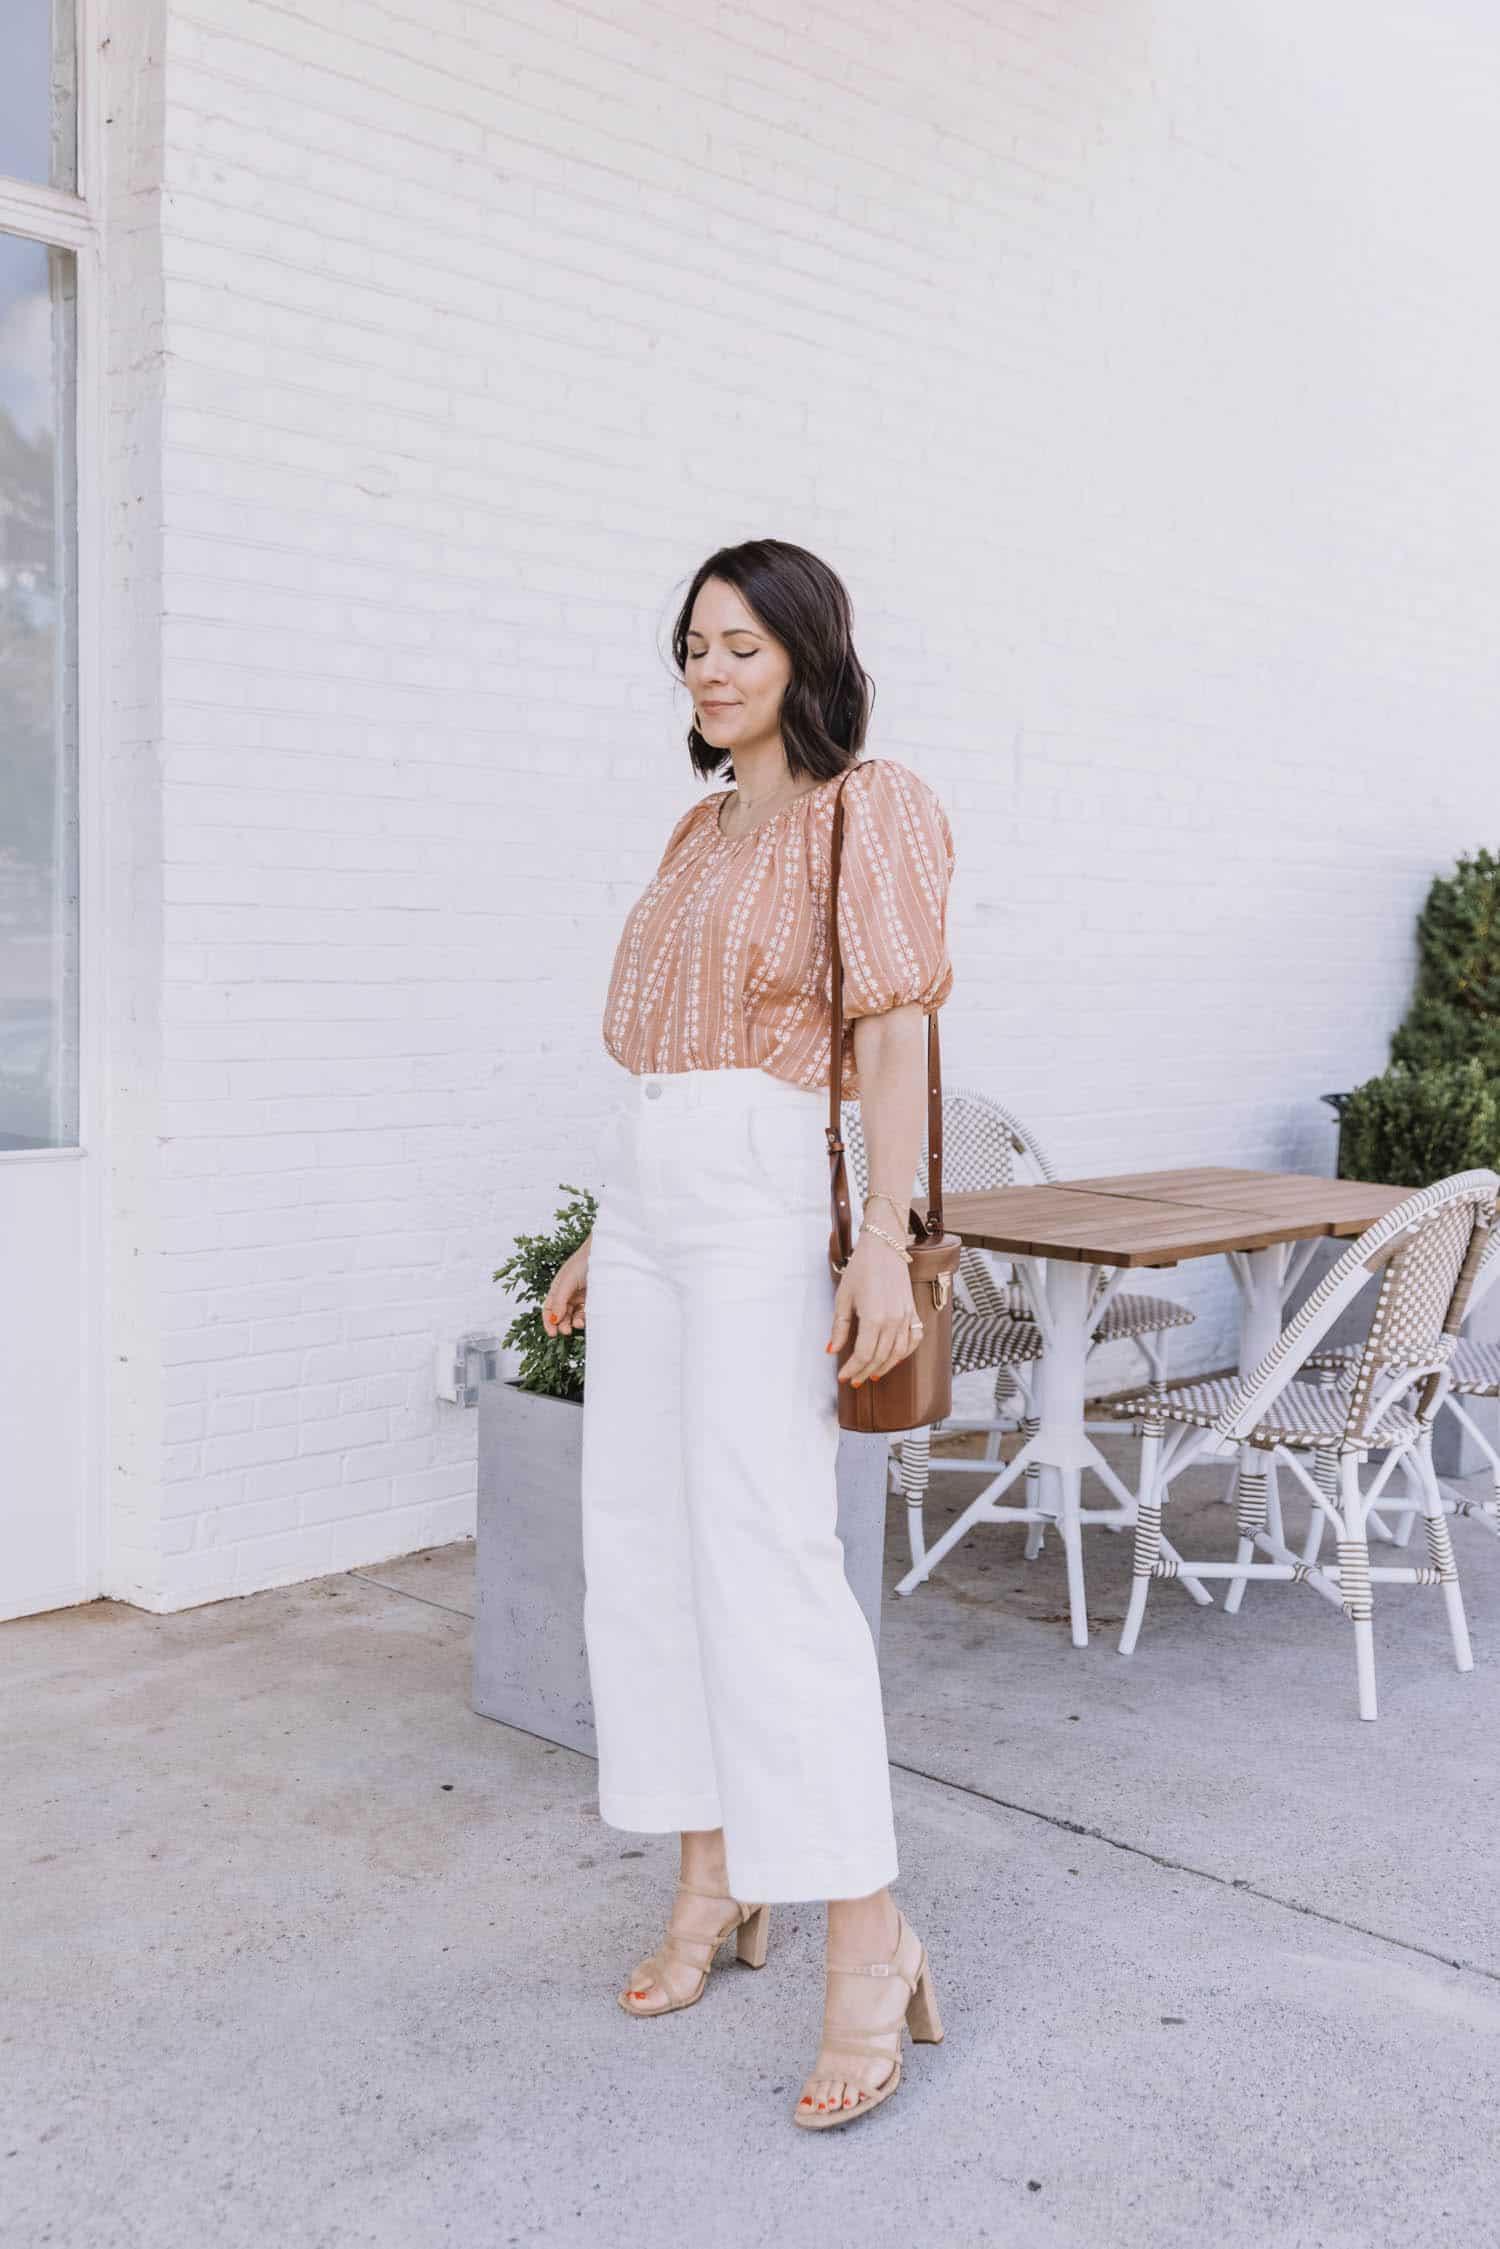 Bringing Back The White Crop Jean for Summer